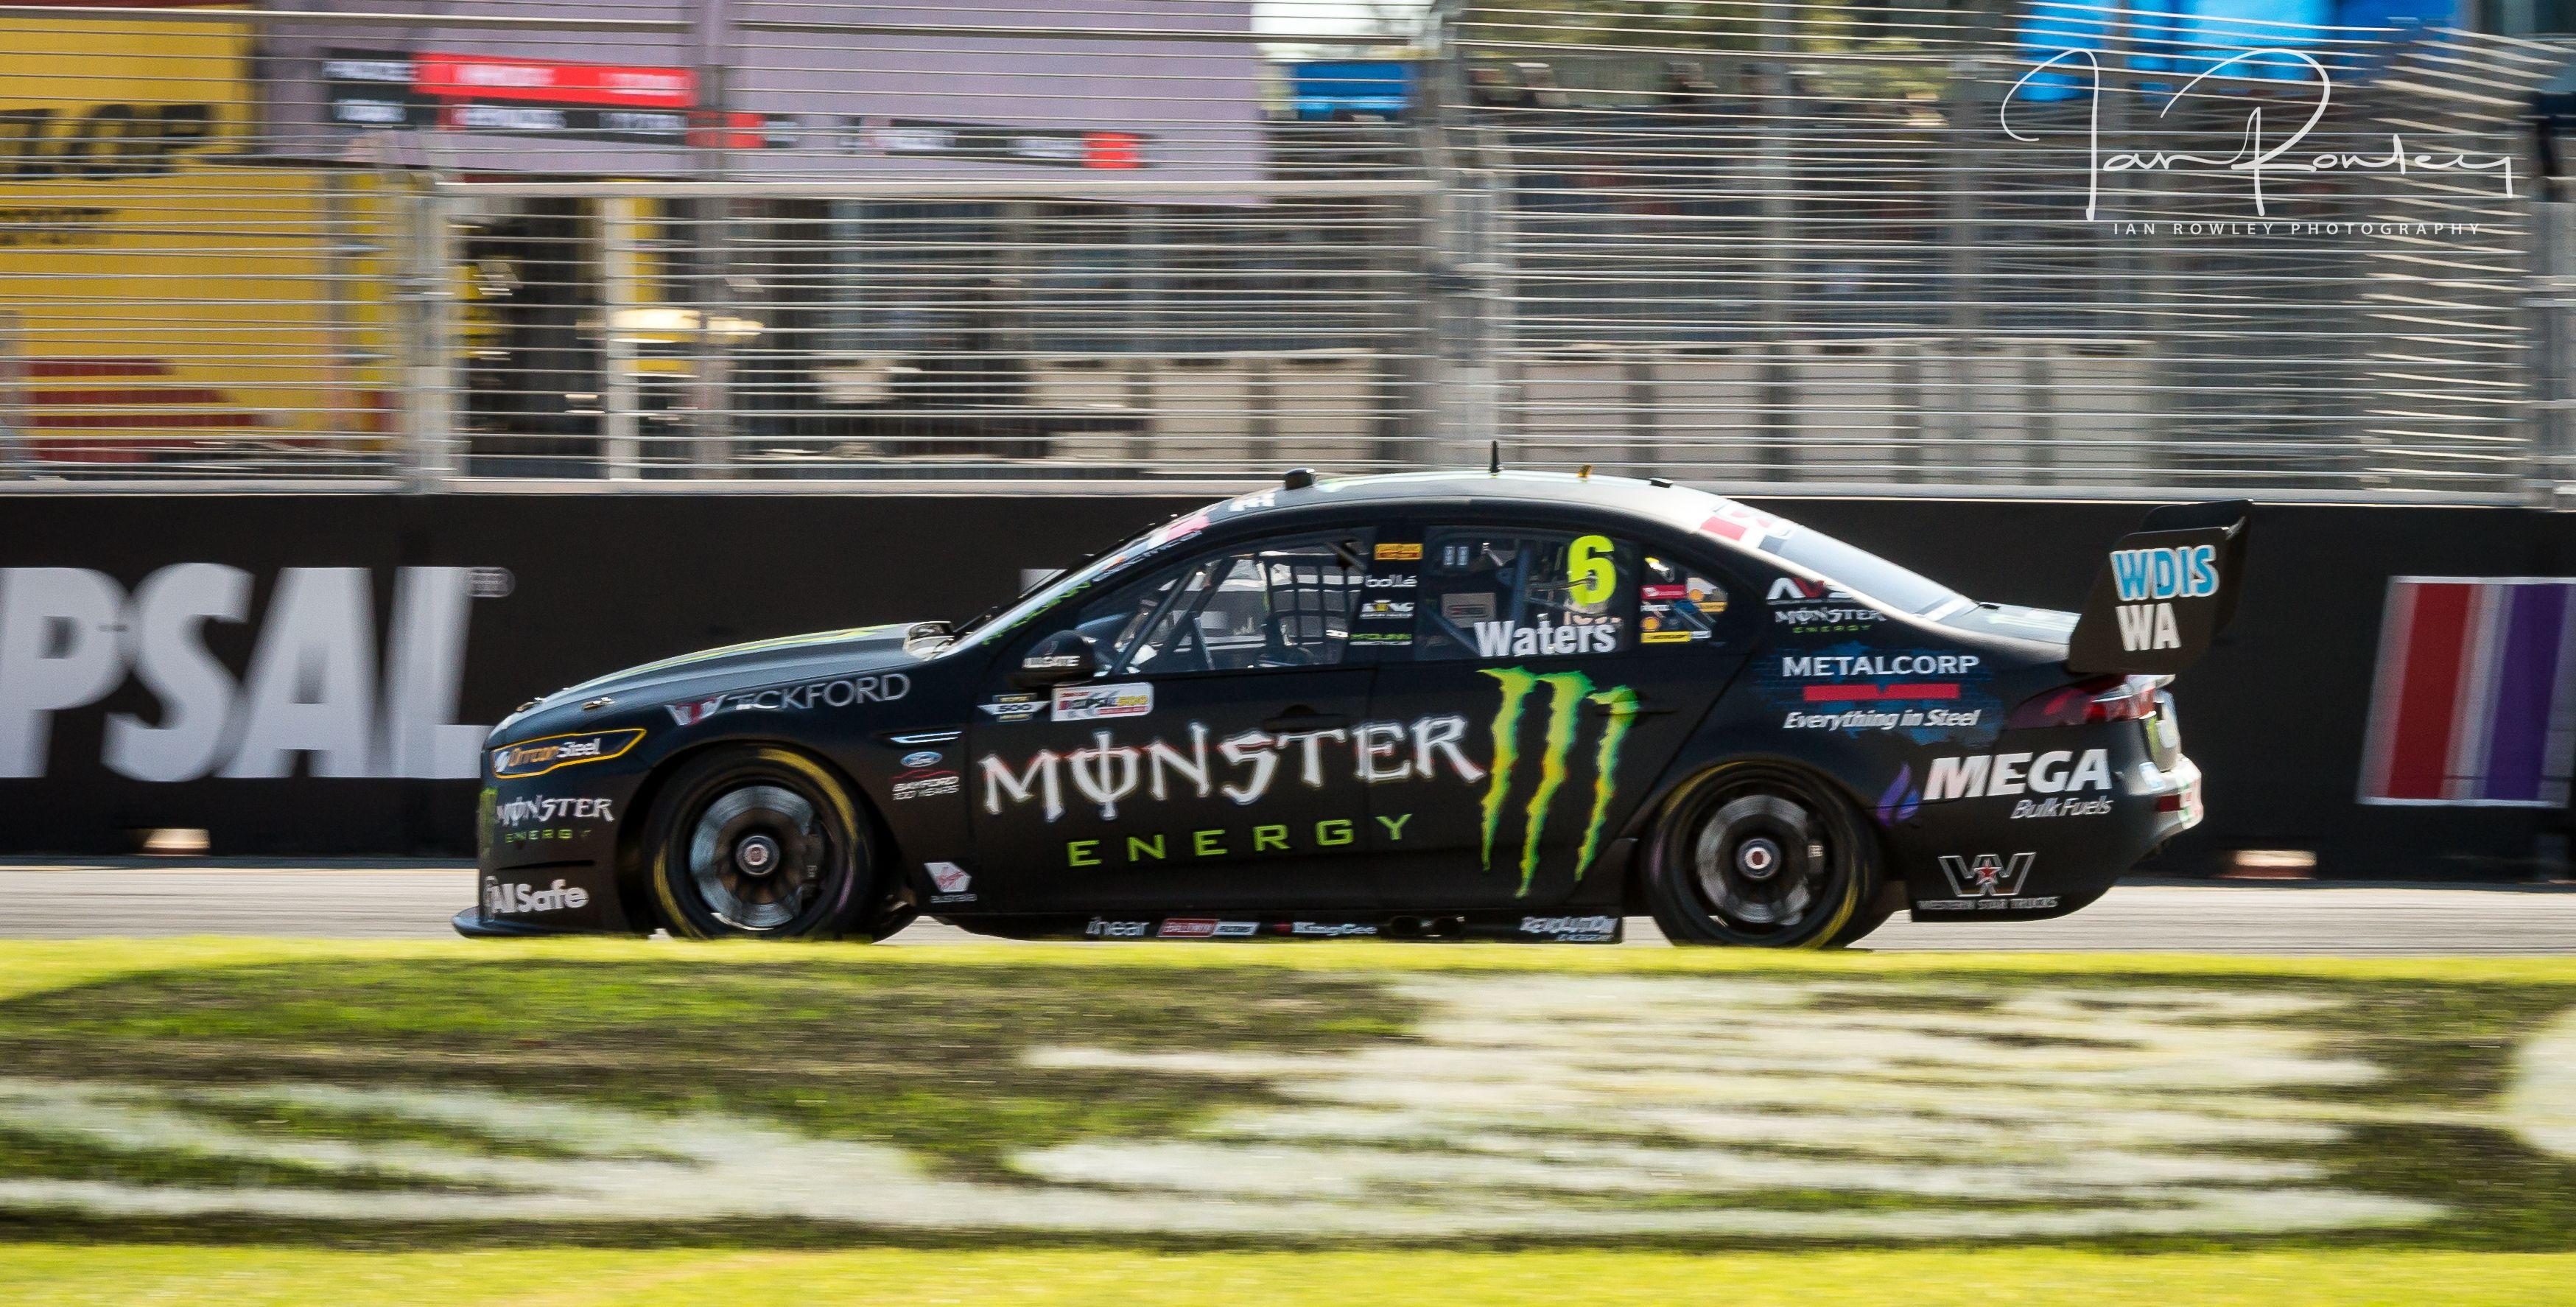 Cam Waters Monster Energy Racing Clipsal 500 2017 Australian V8 Supercars Racing Monster Energy